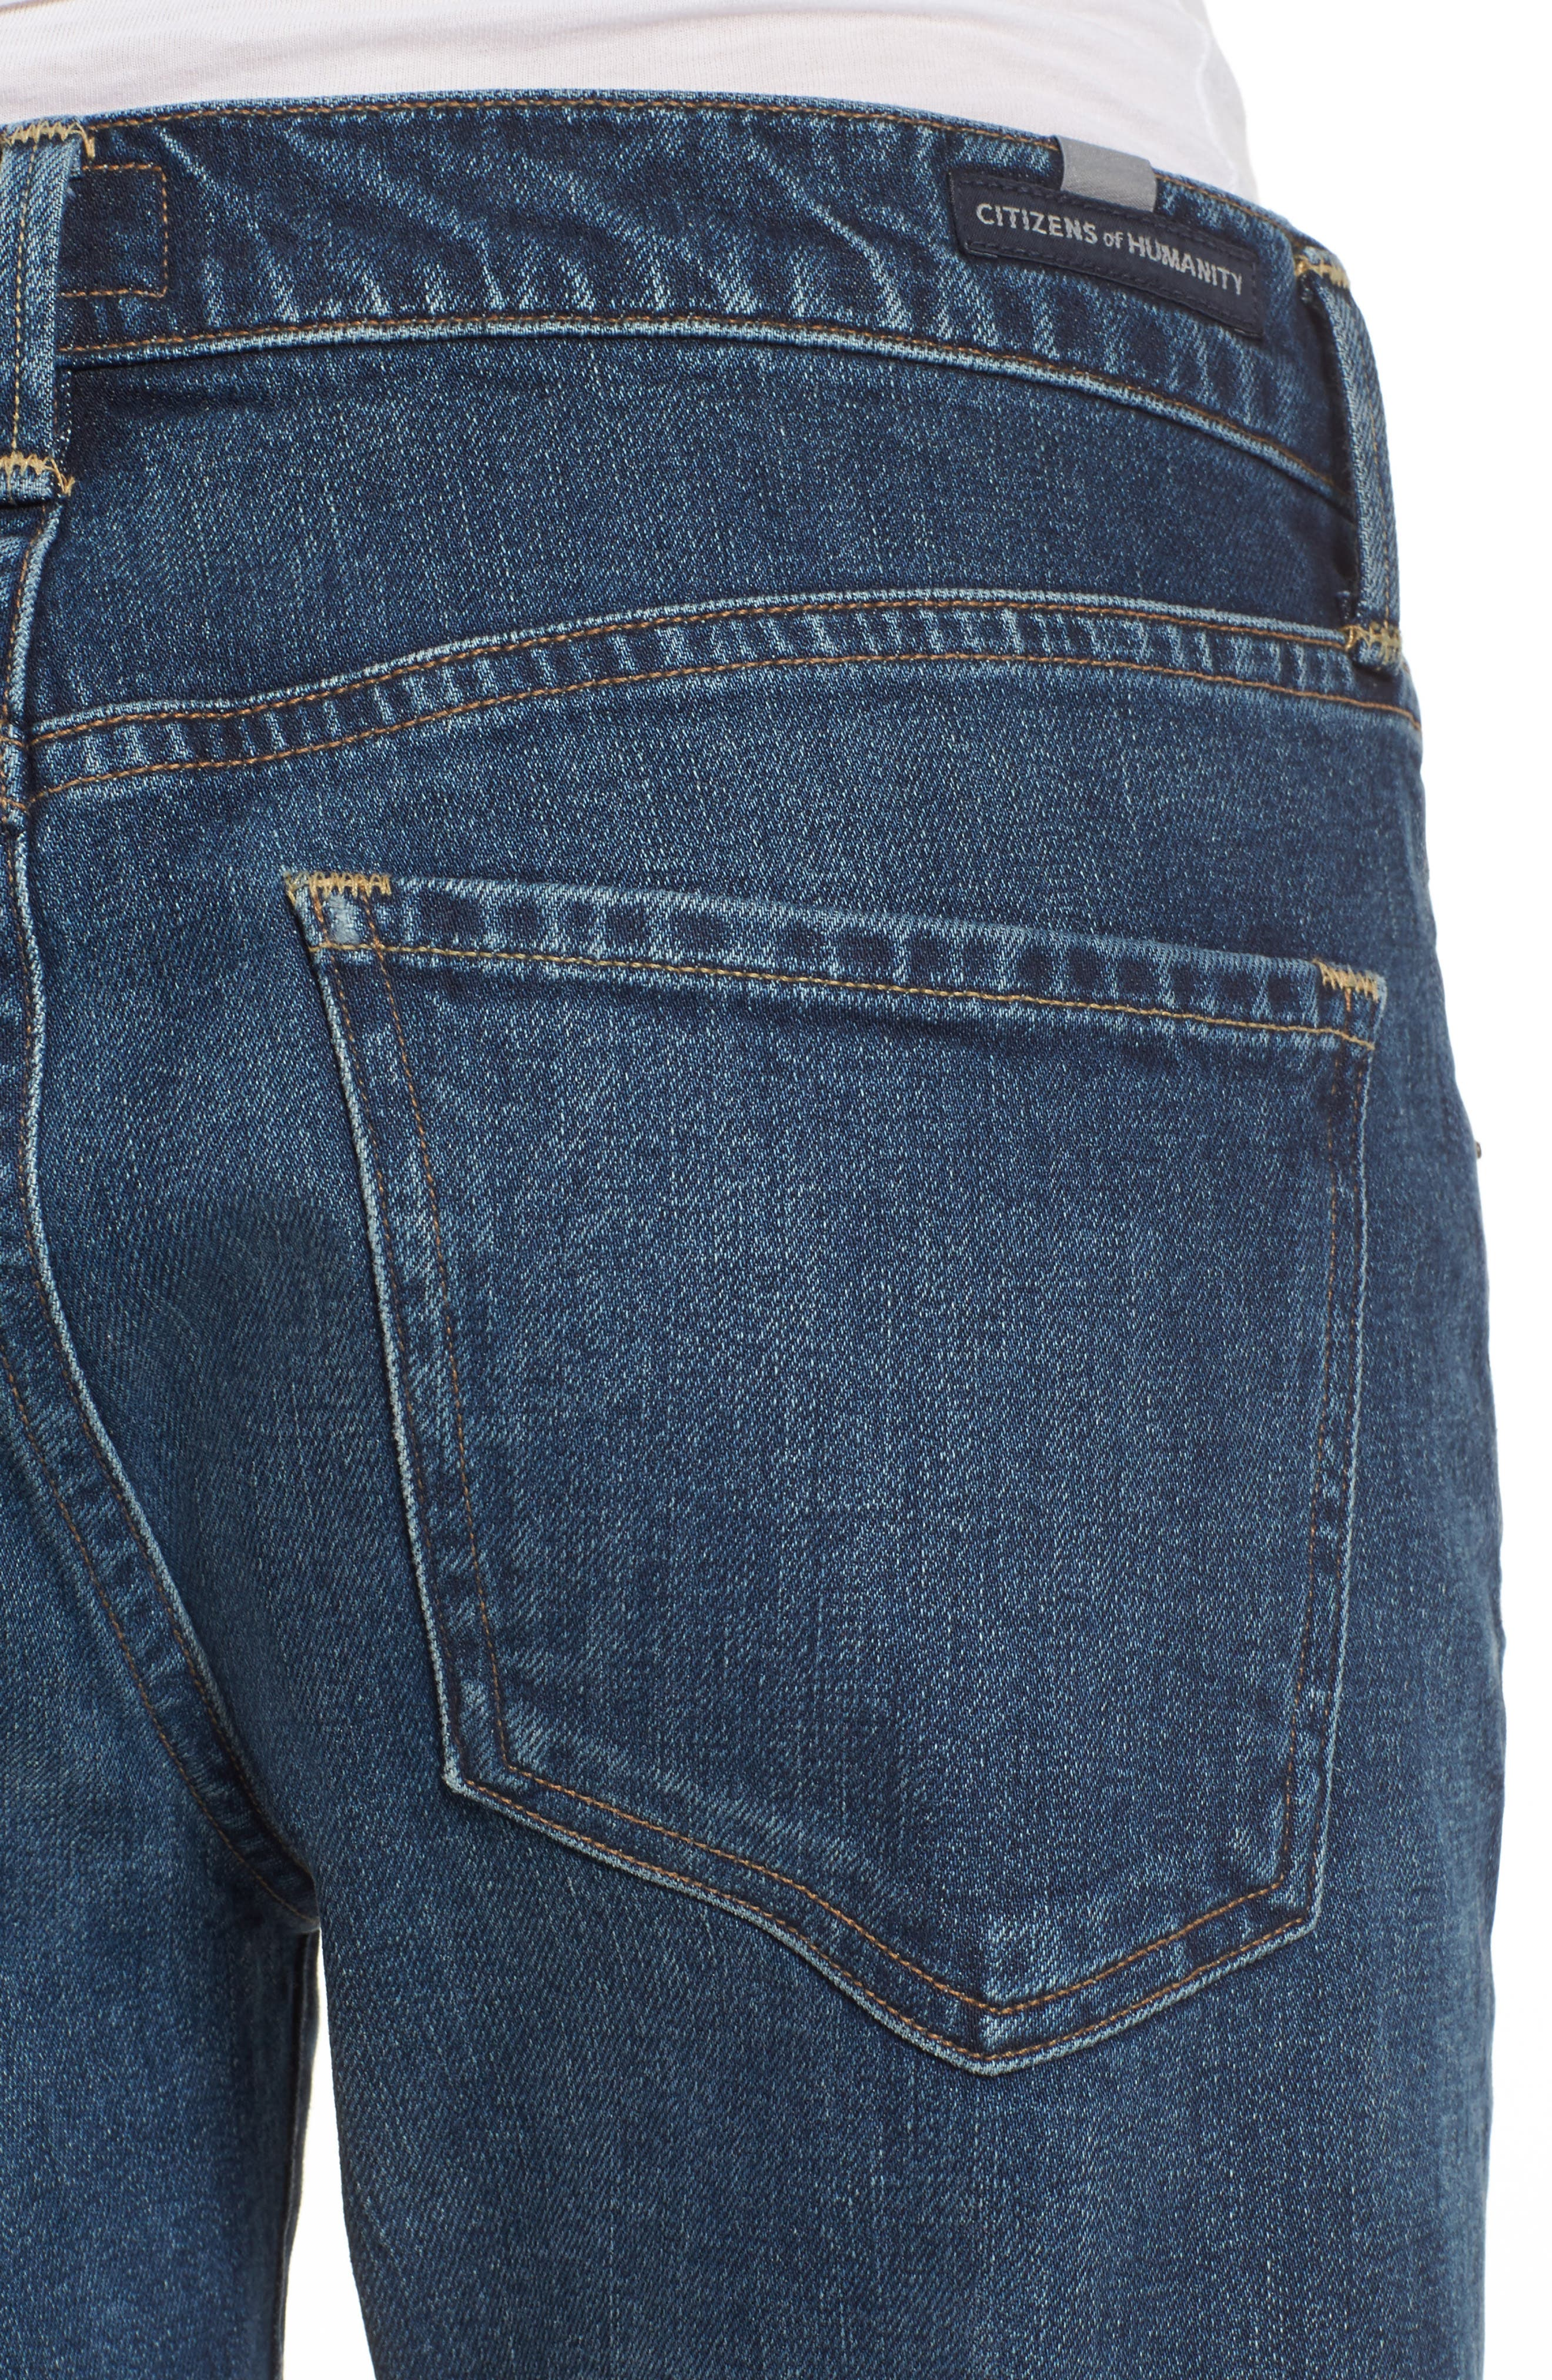 Emerson Slim Boyfriend Jeans,                             Alternate thumbnail 6, color,                             New Moon